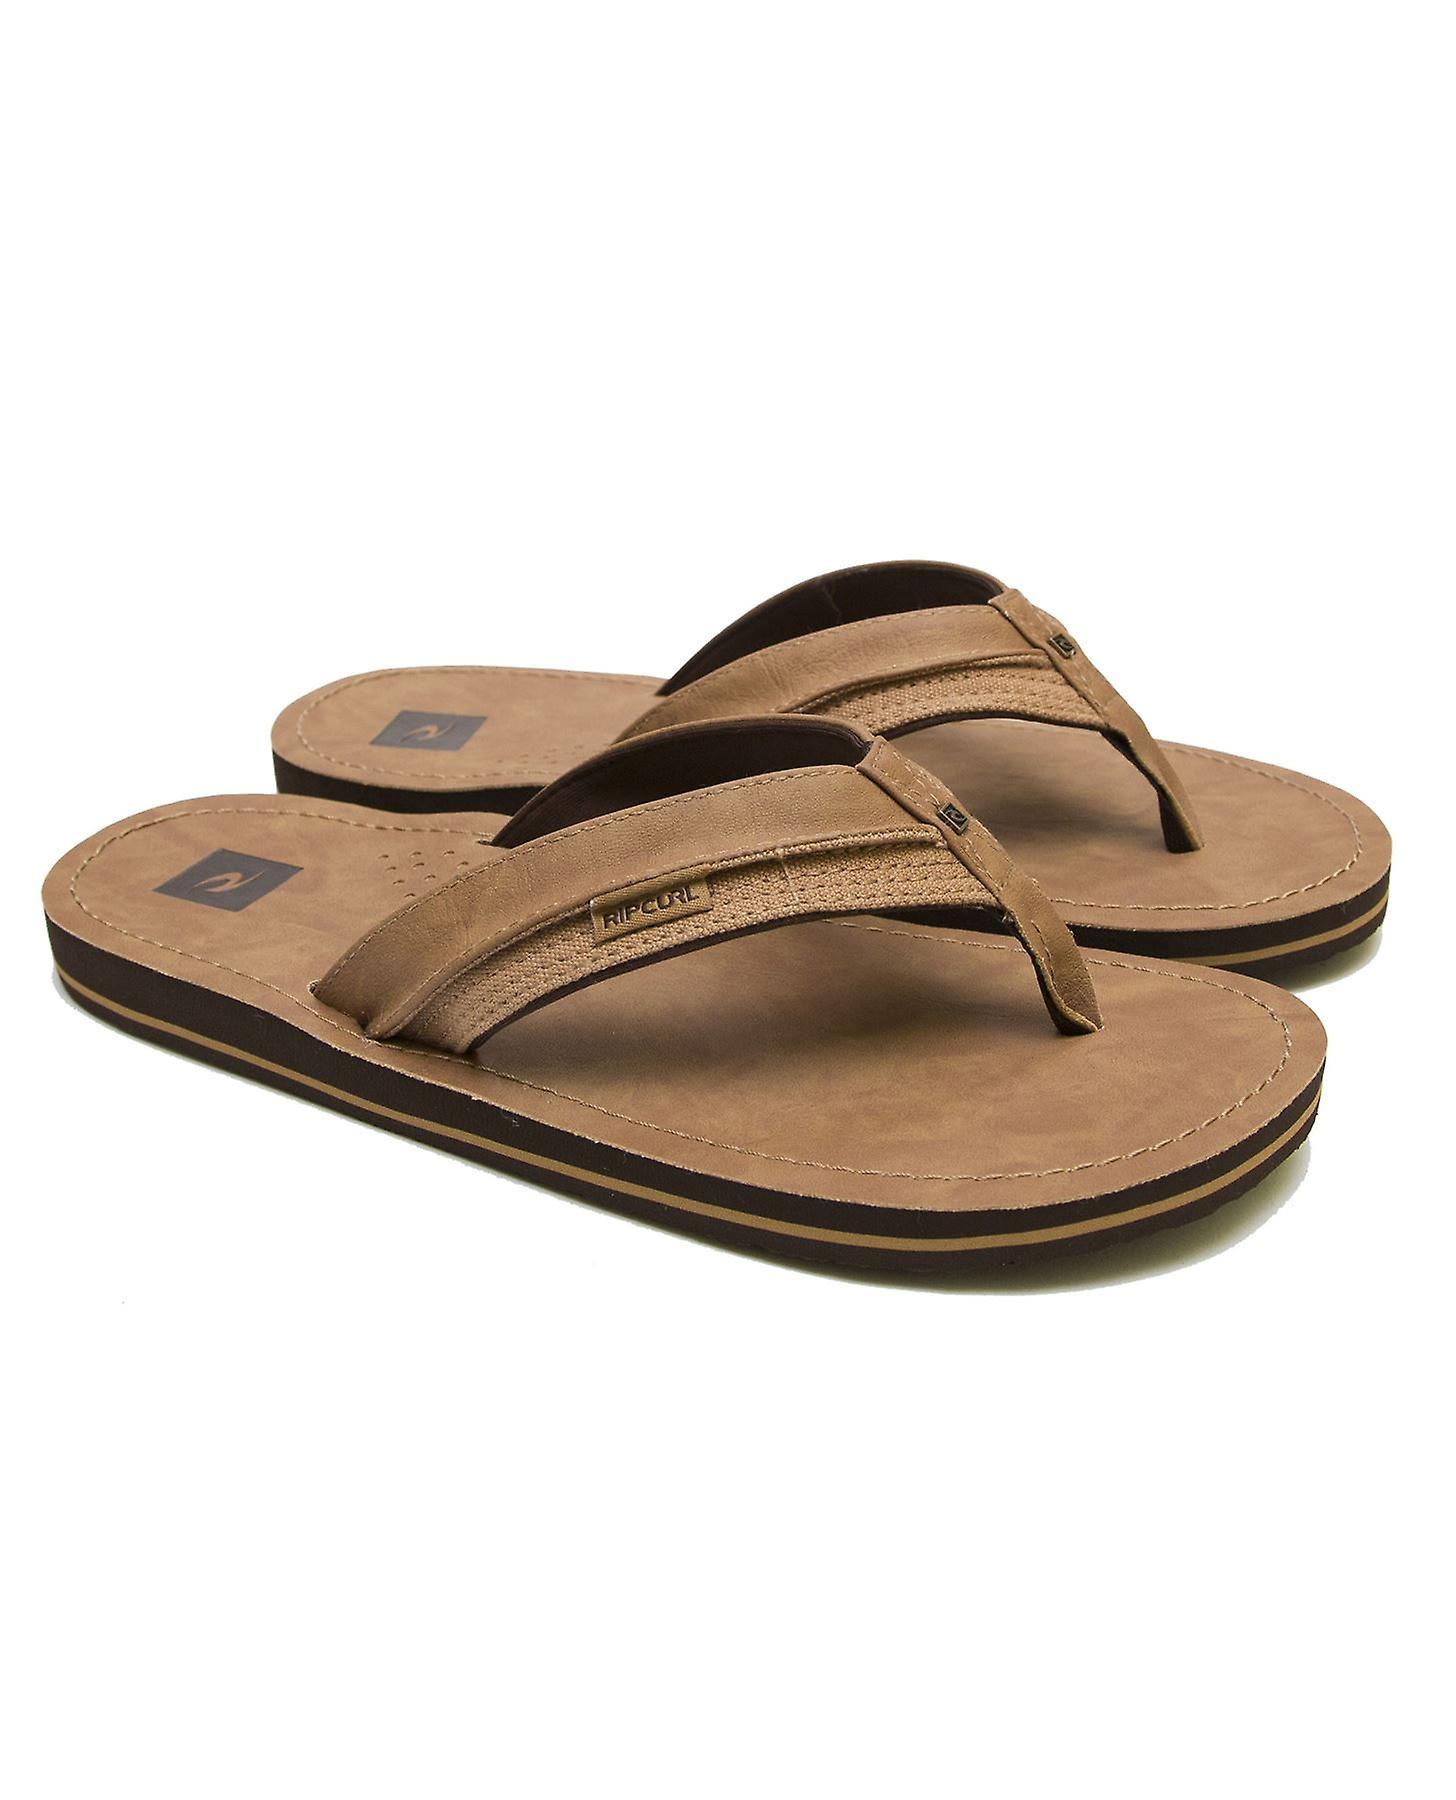 Rip Curl Men's Sandals ~ Ox multi/tan